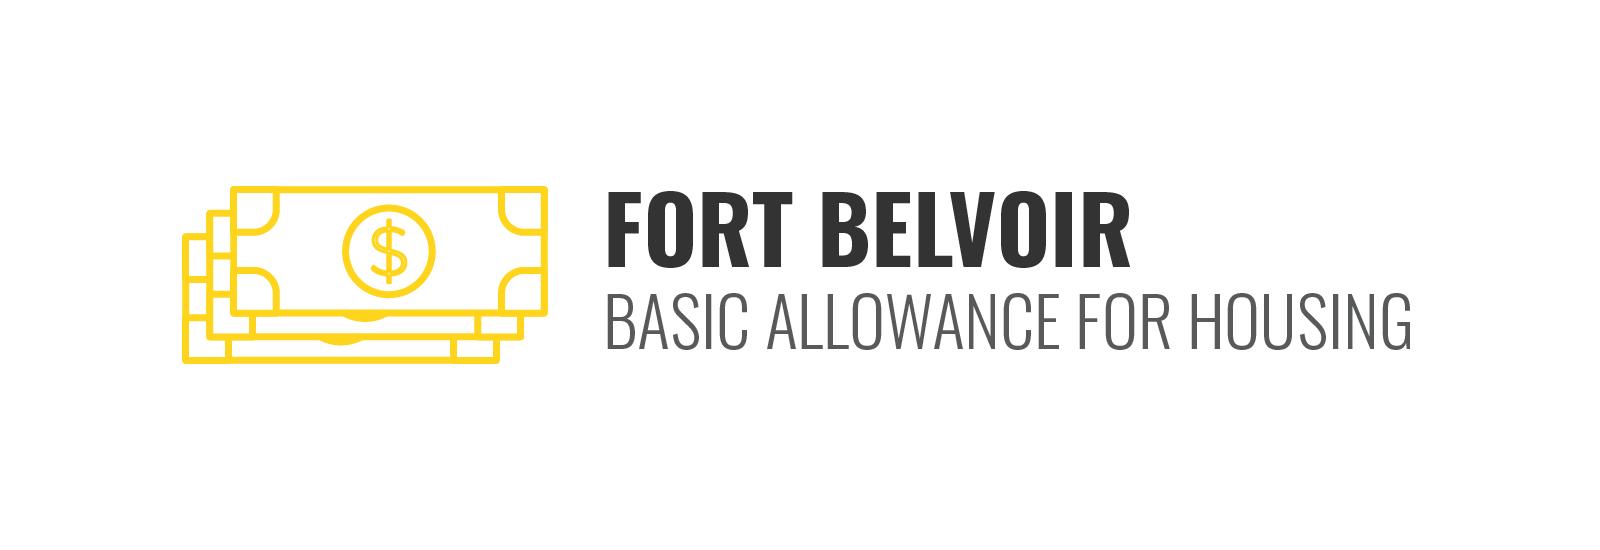 Fort Belvoir BAH